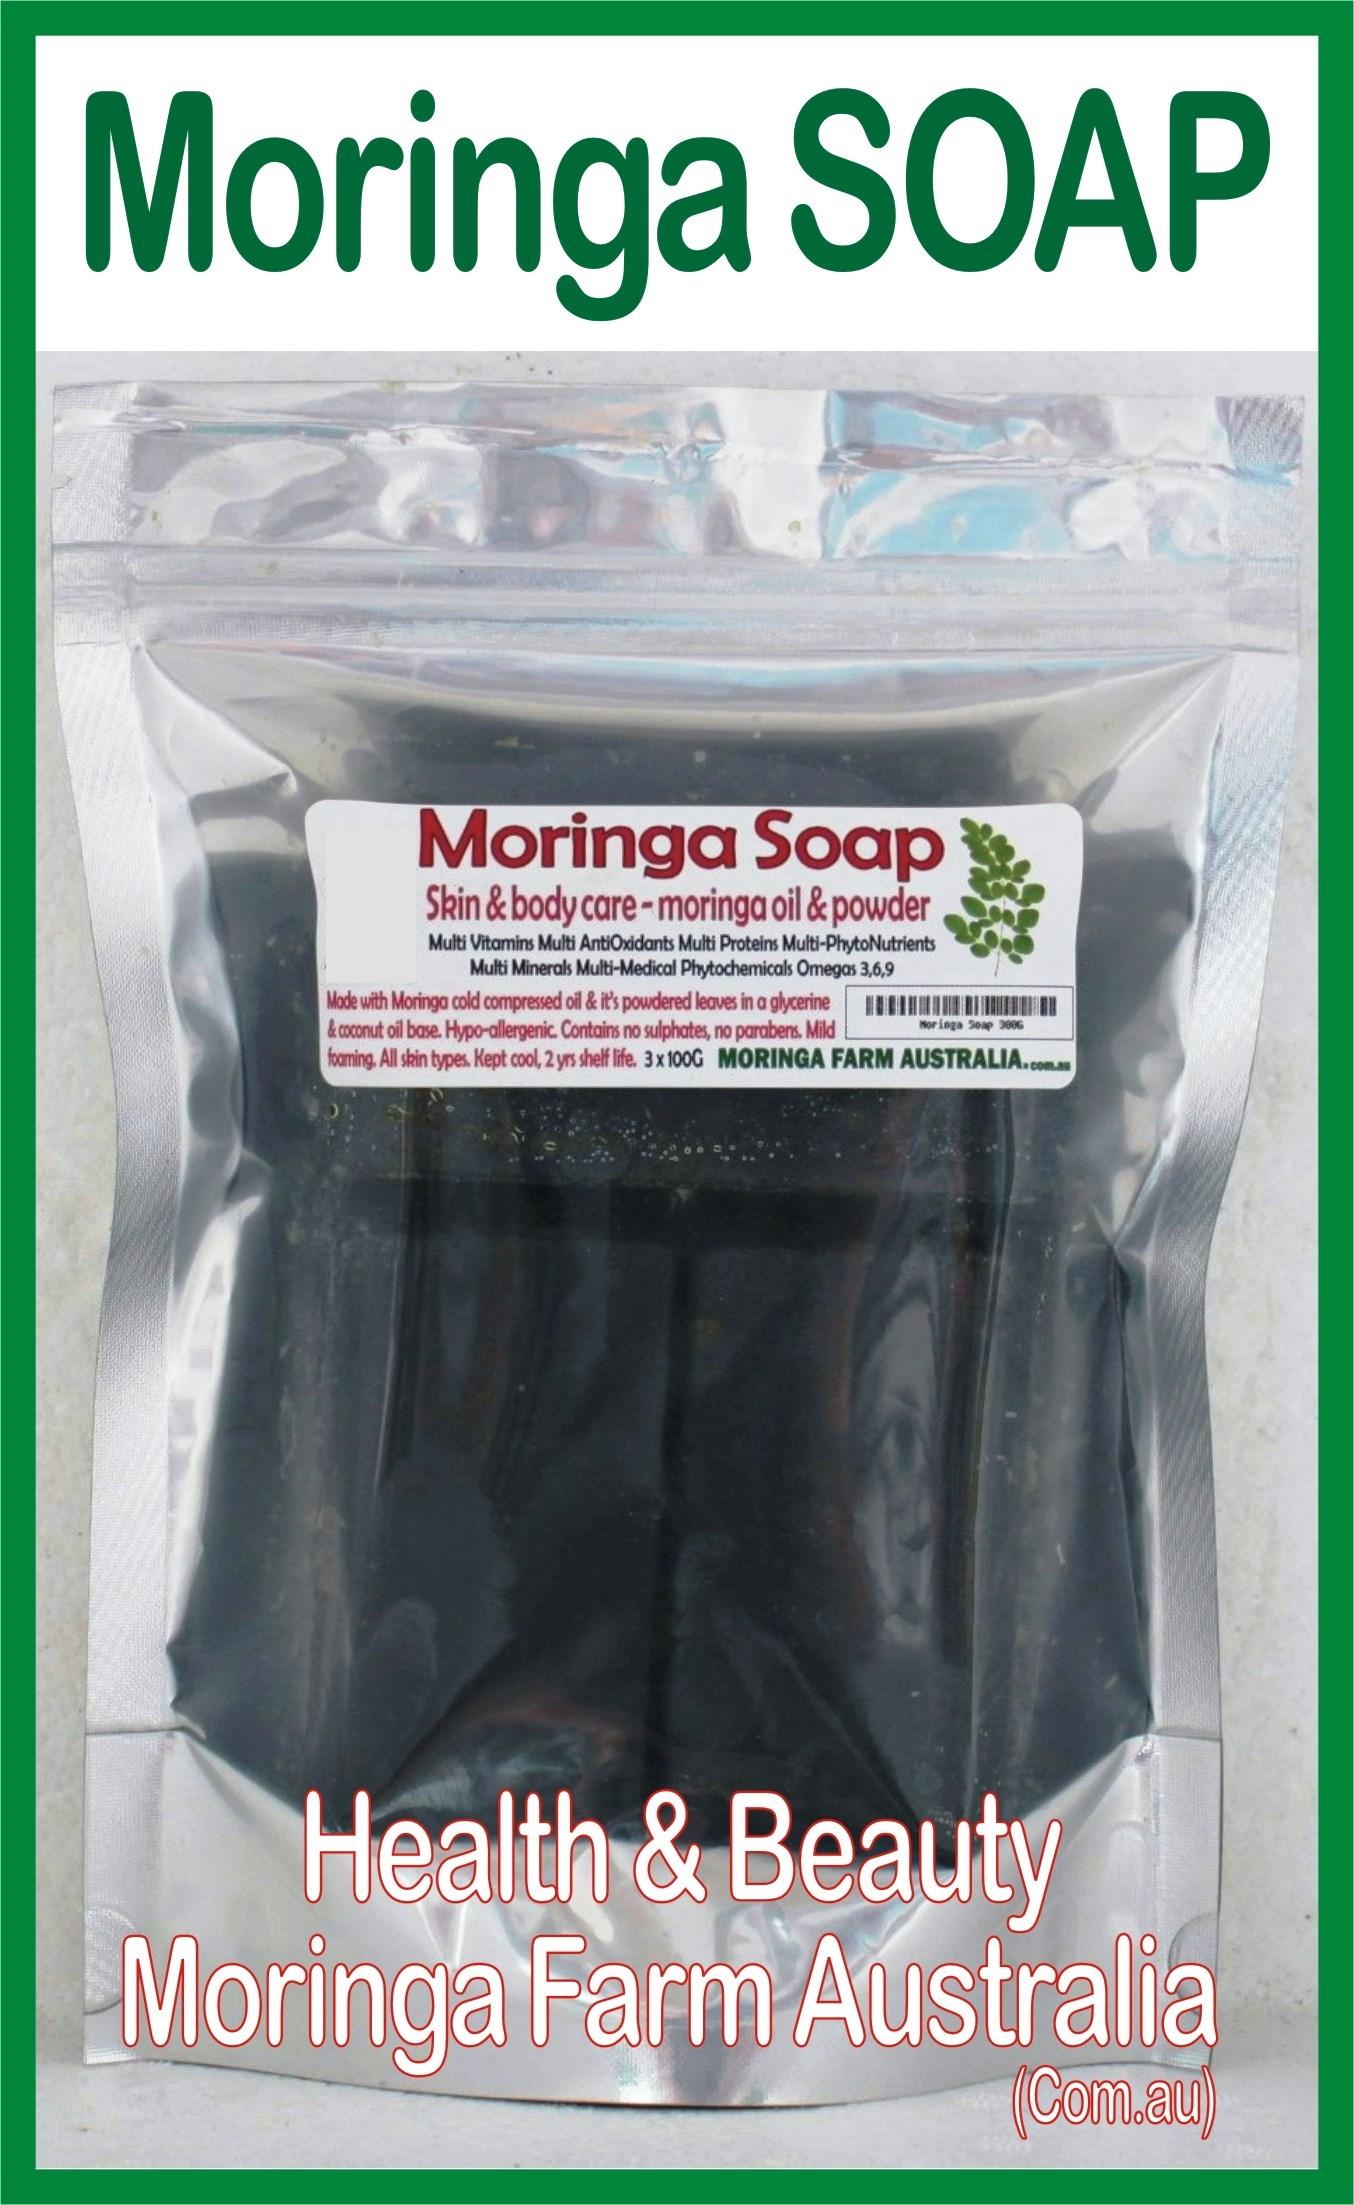 AUSTRALIAN Moringa SOAP 3 X 100G - Moringa seed oil & ground leaf prep.